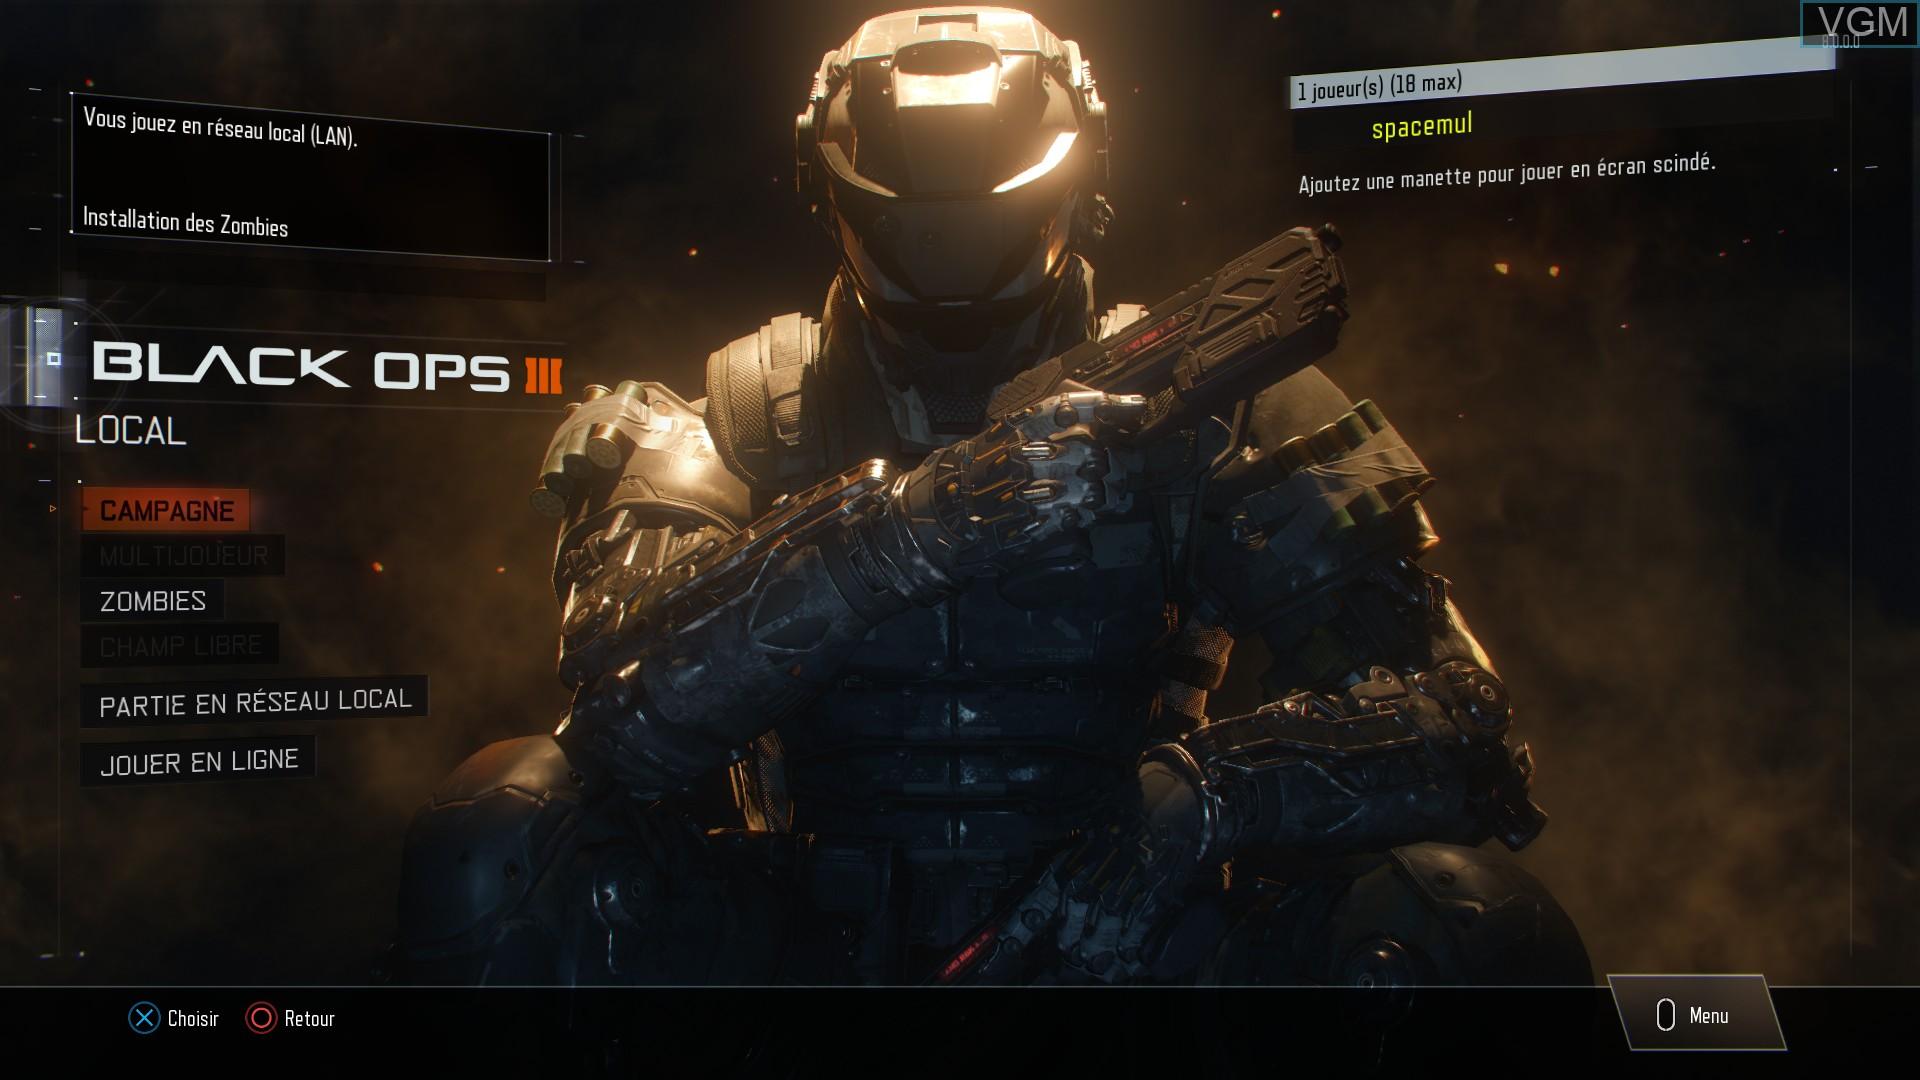 Image du menu du jeu Call of Duty - Black Ops III sur Sony Playstation 4